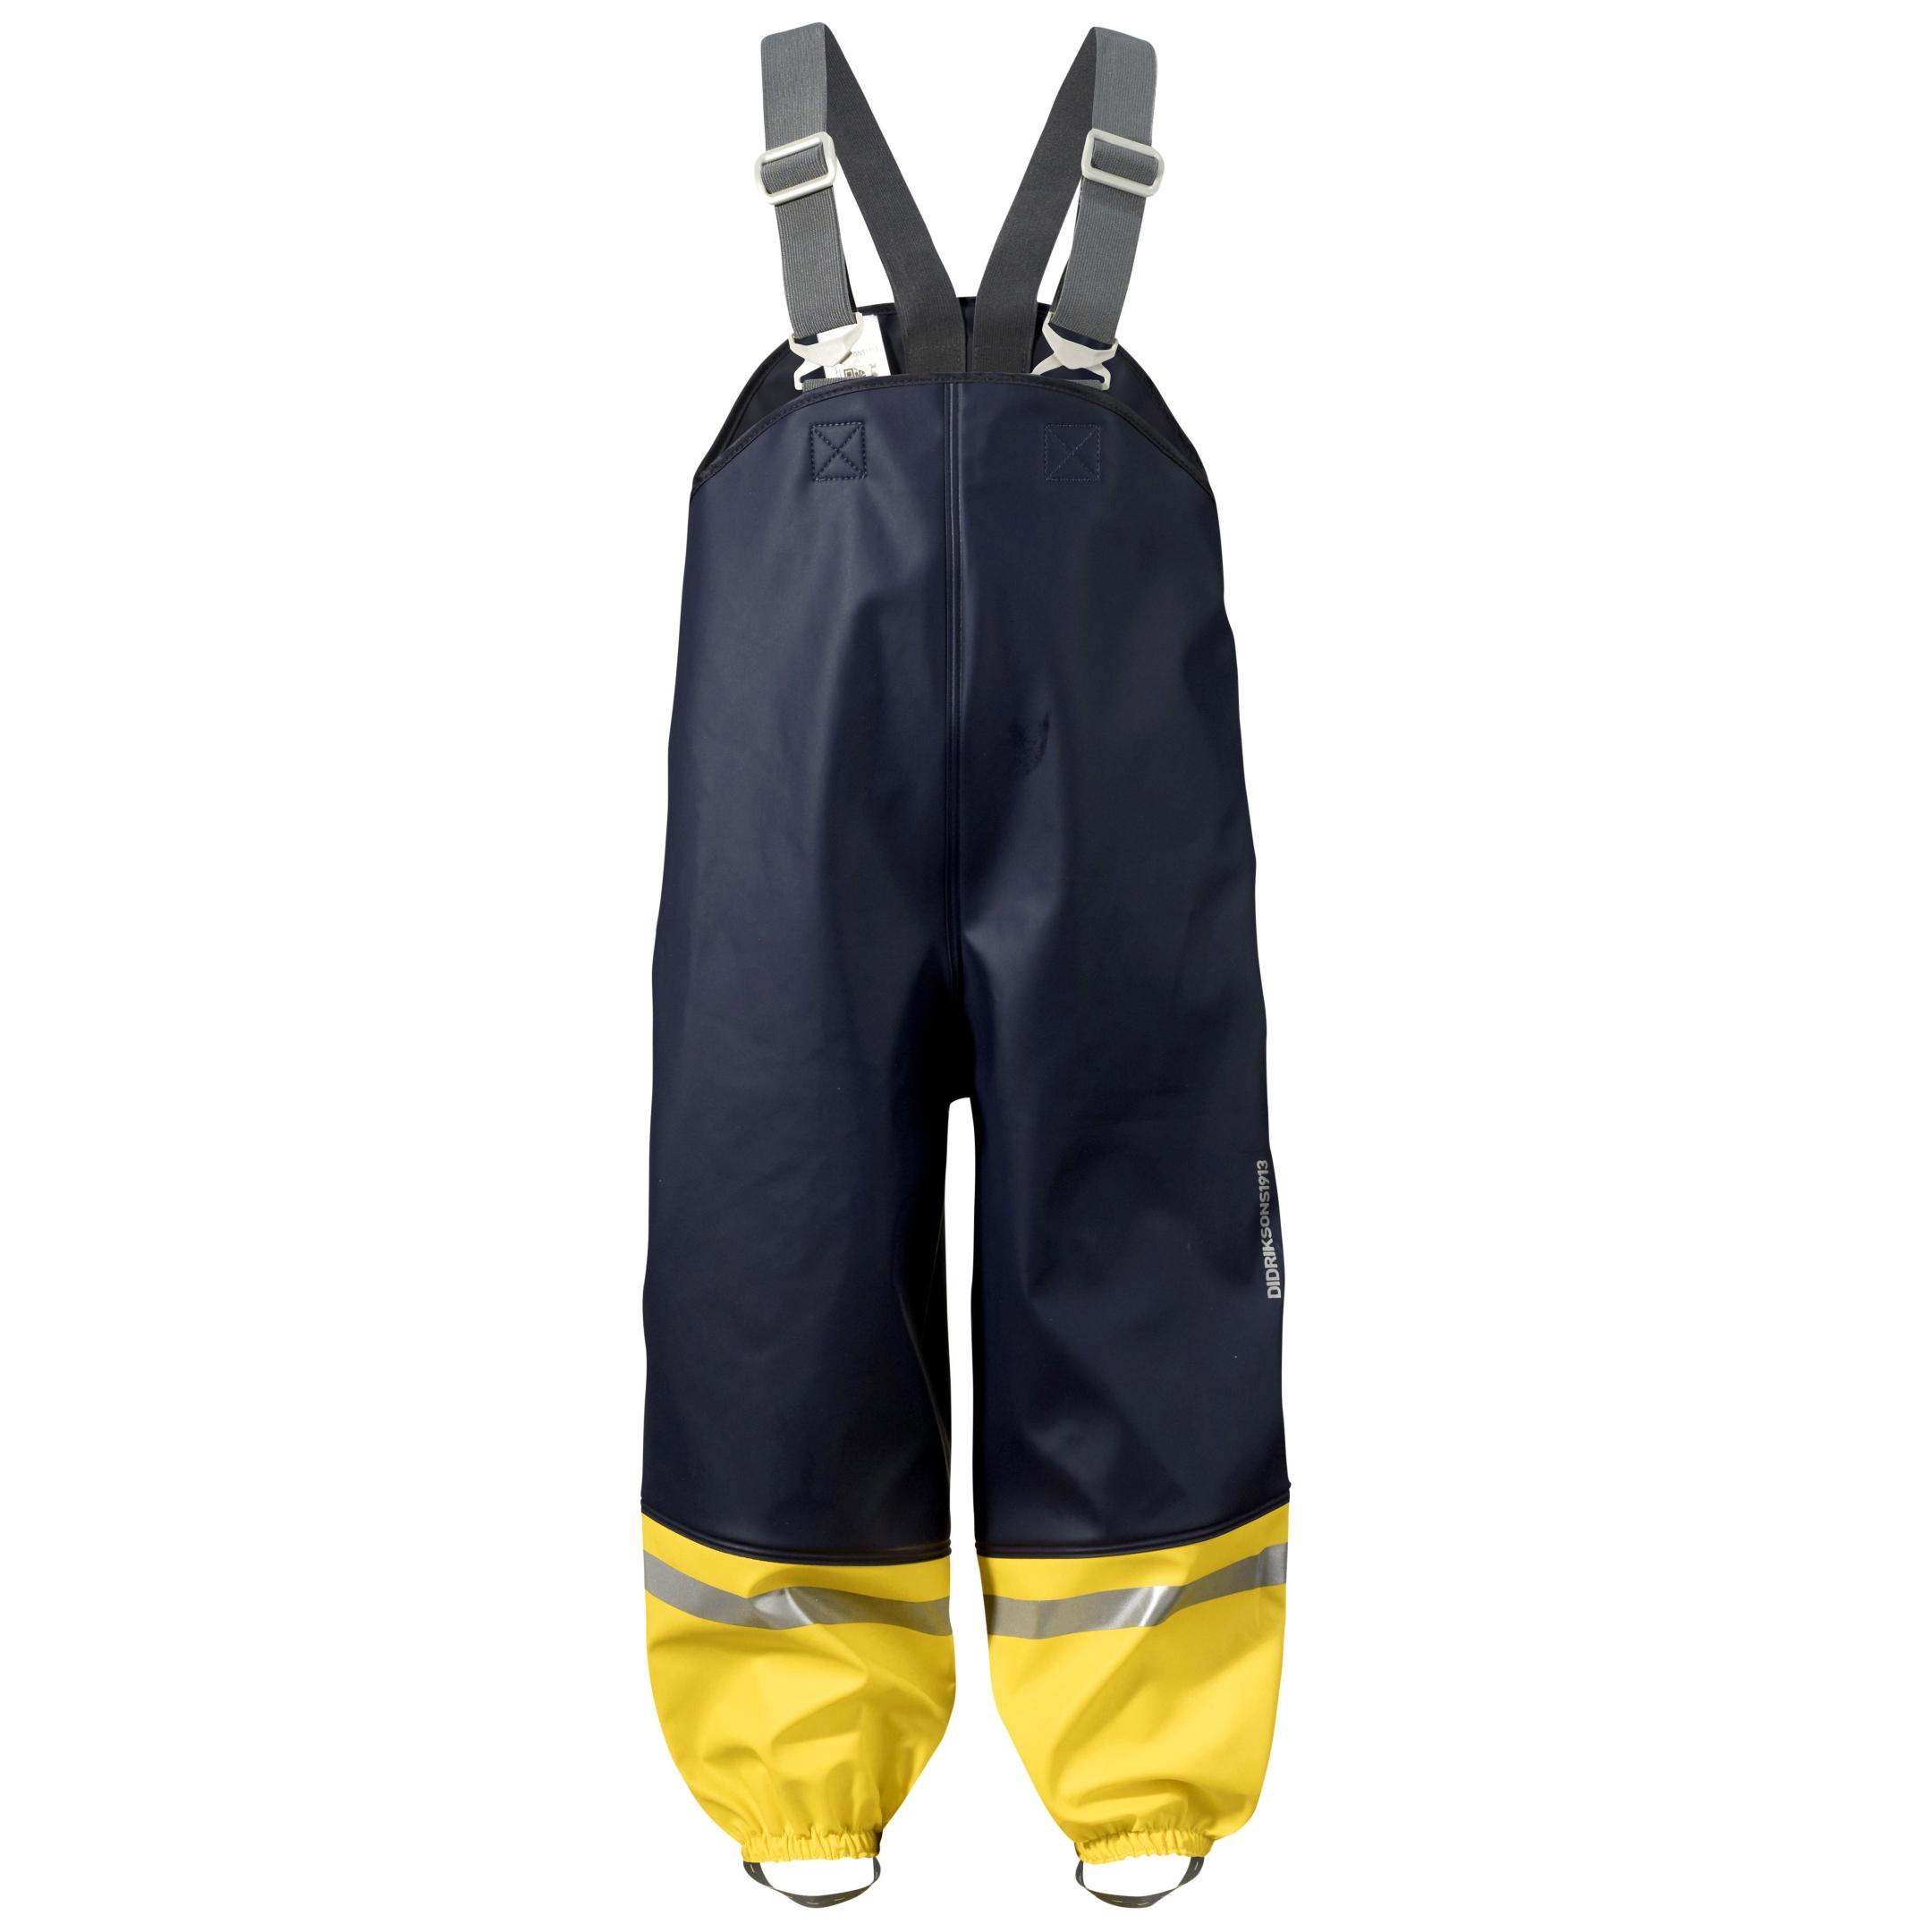 Дидриксон детский костюм дождевой WATERMAN + средство для стирки, - фото 8